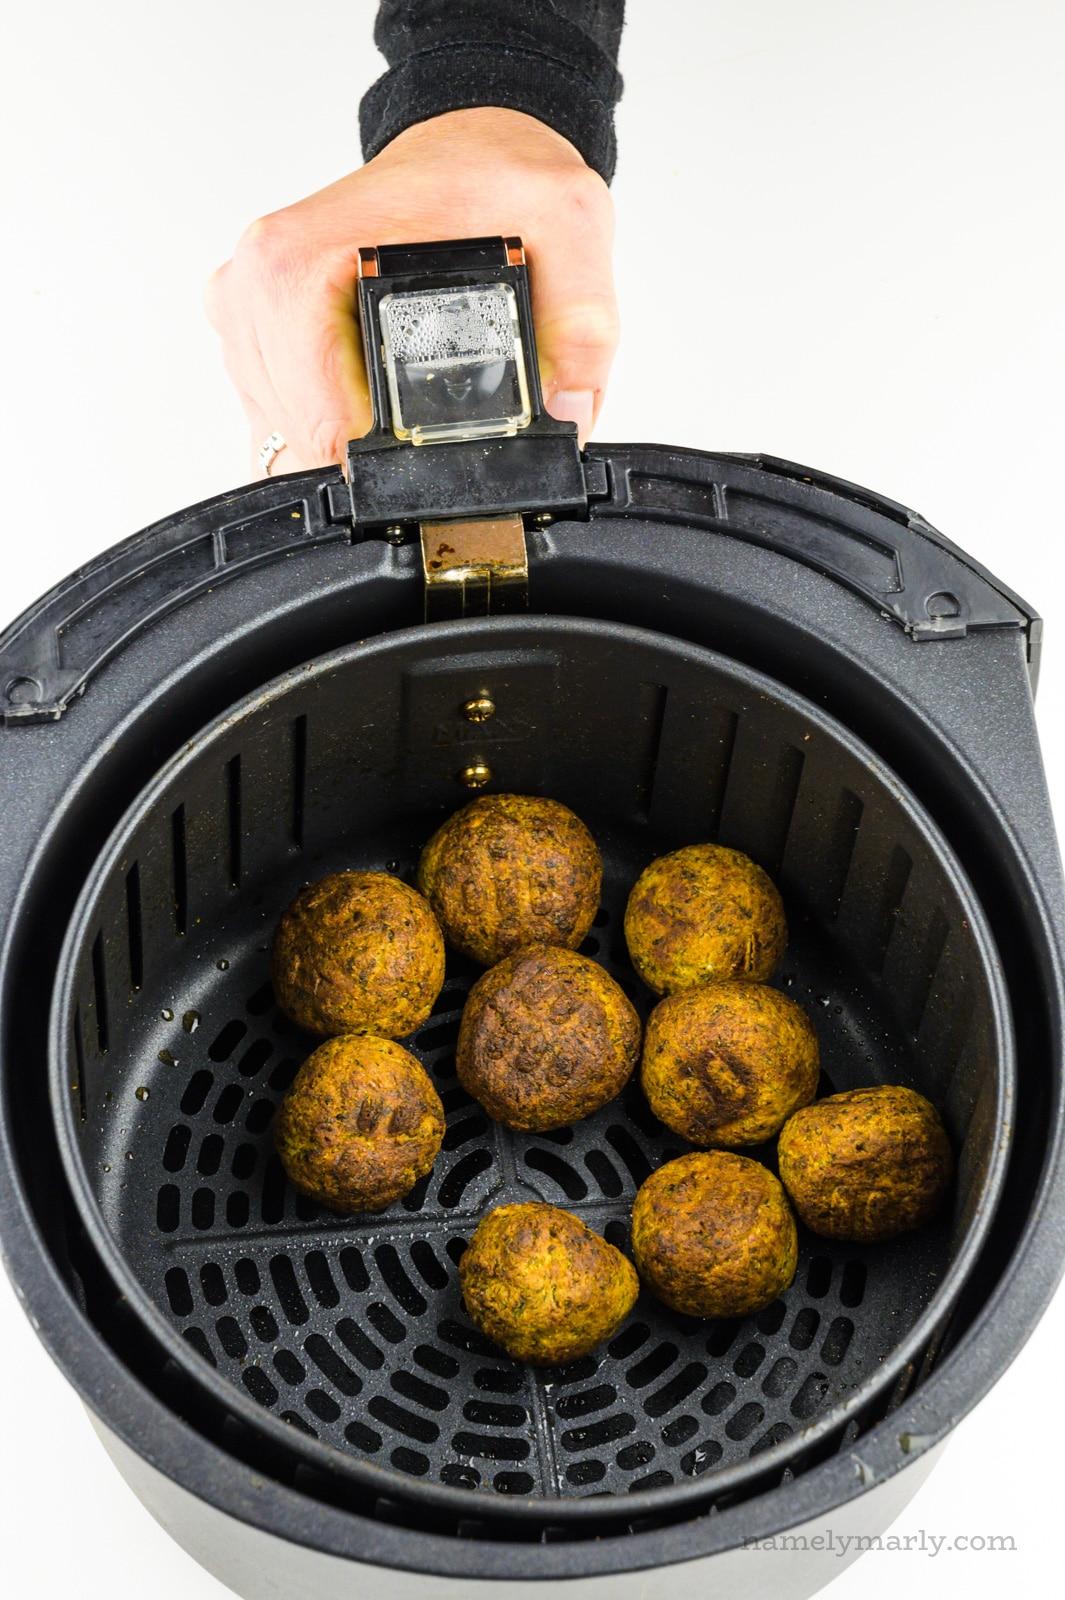 Crispy brown air fried falafel are in an air fryer basket.